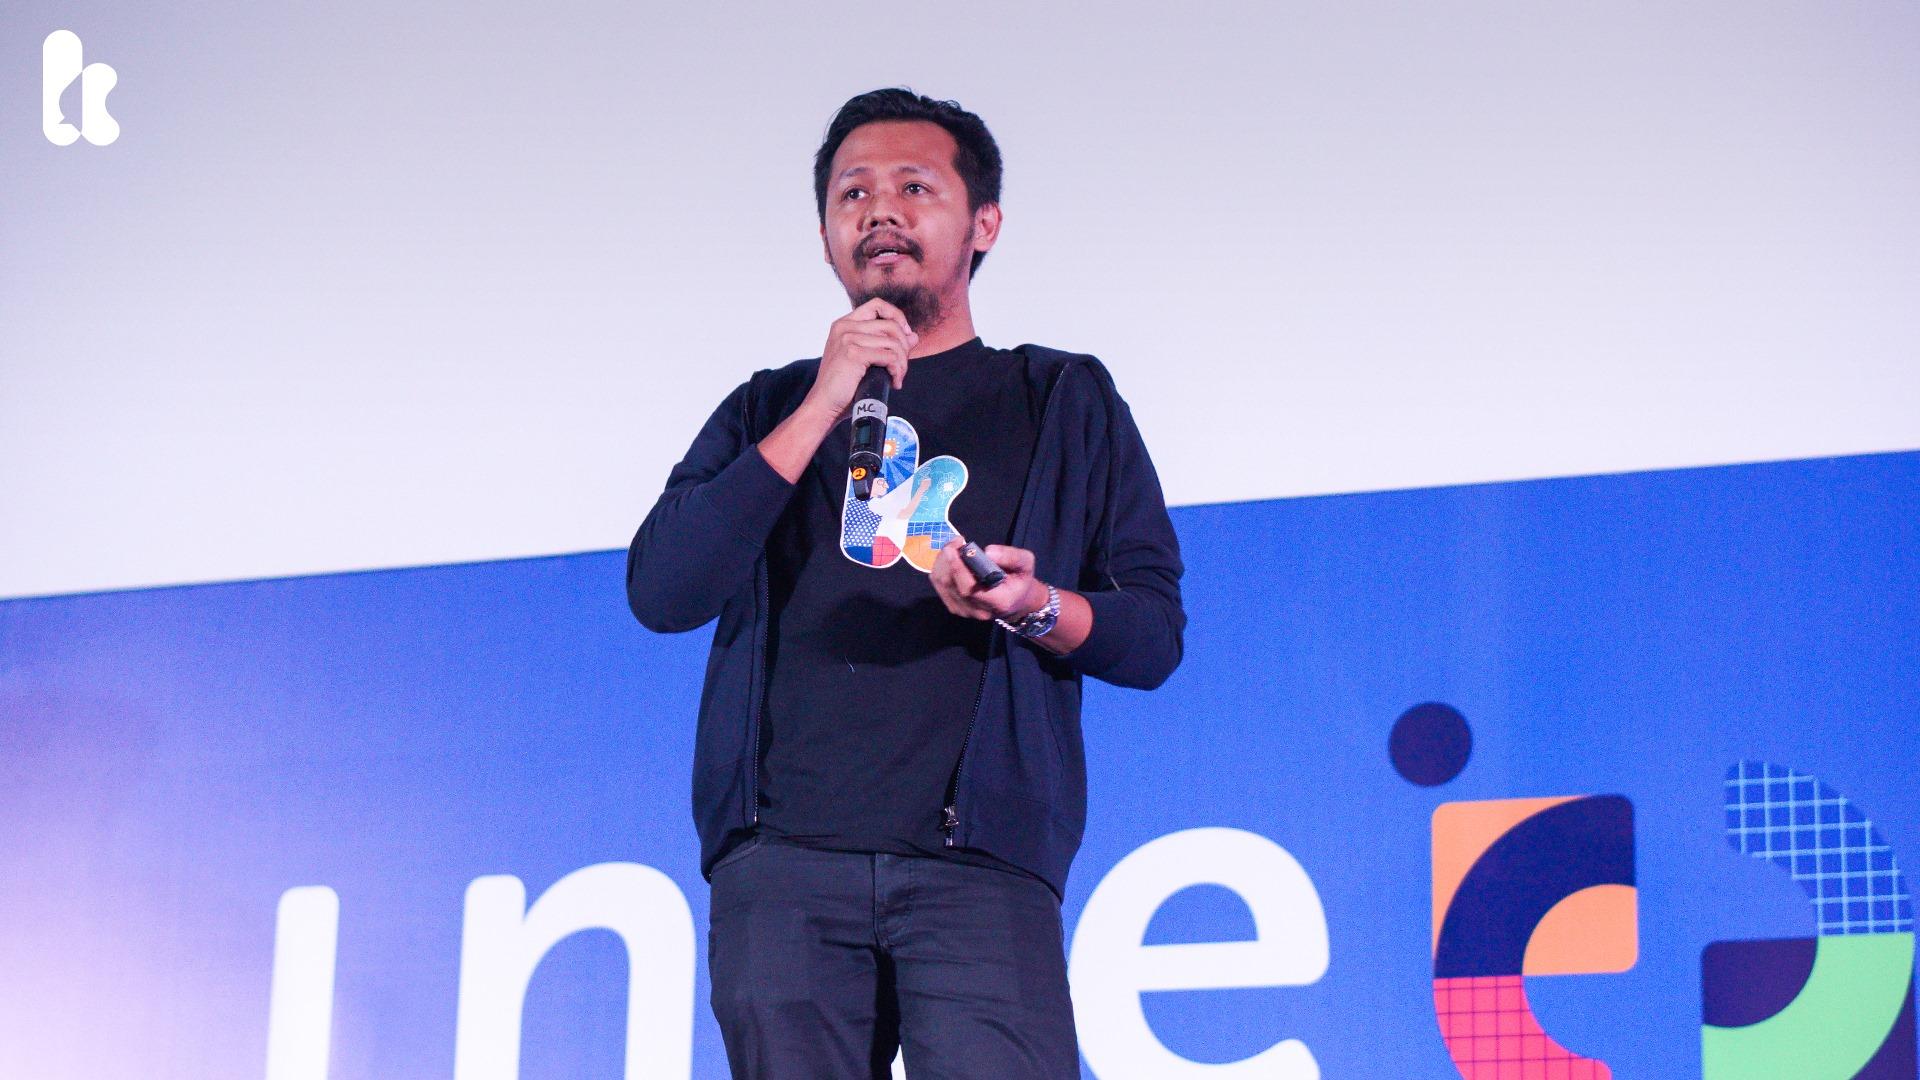 Pria Purnama at INTERACT 2019